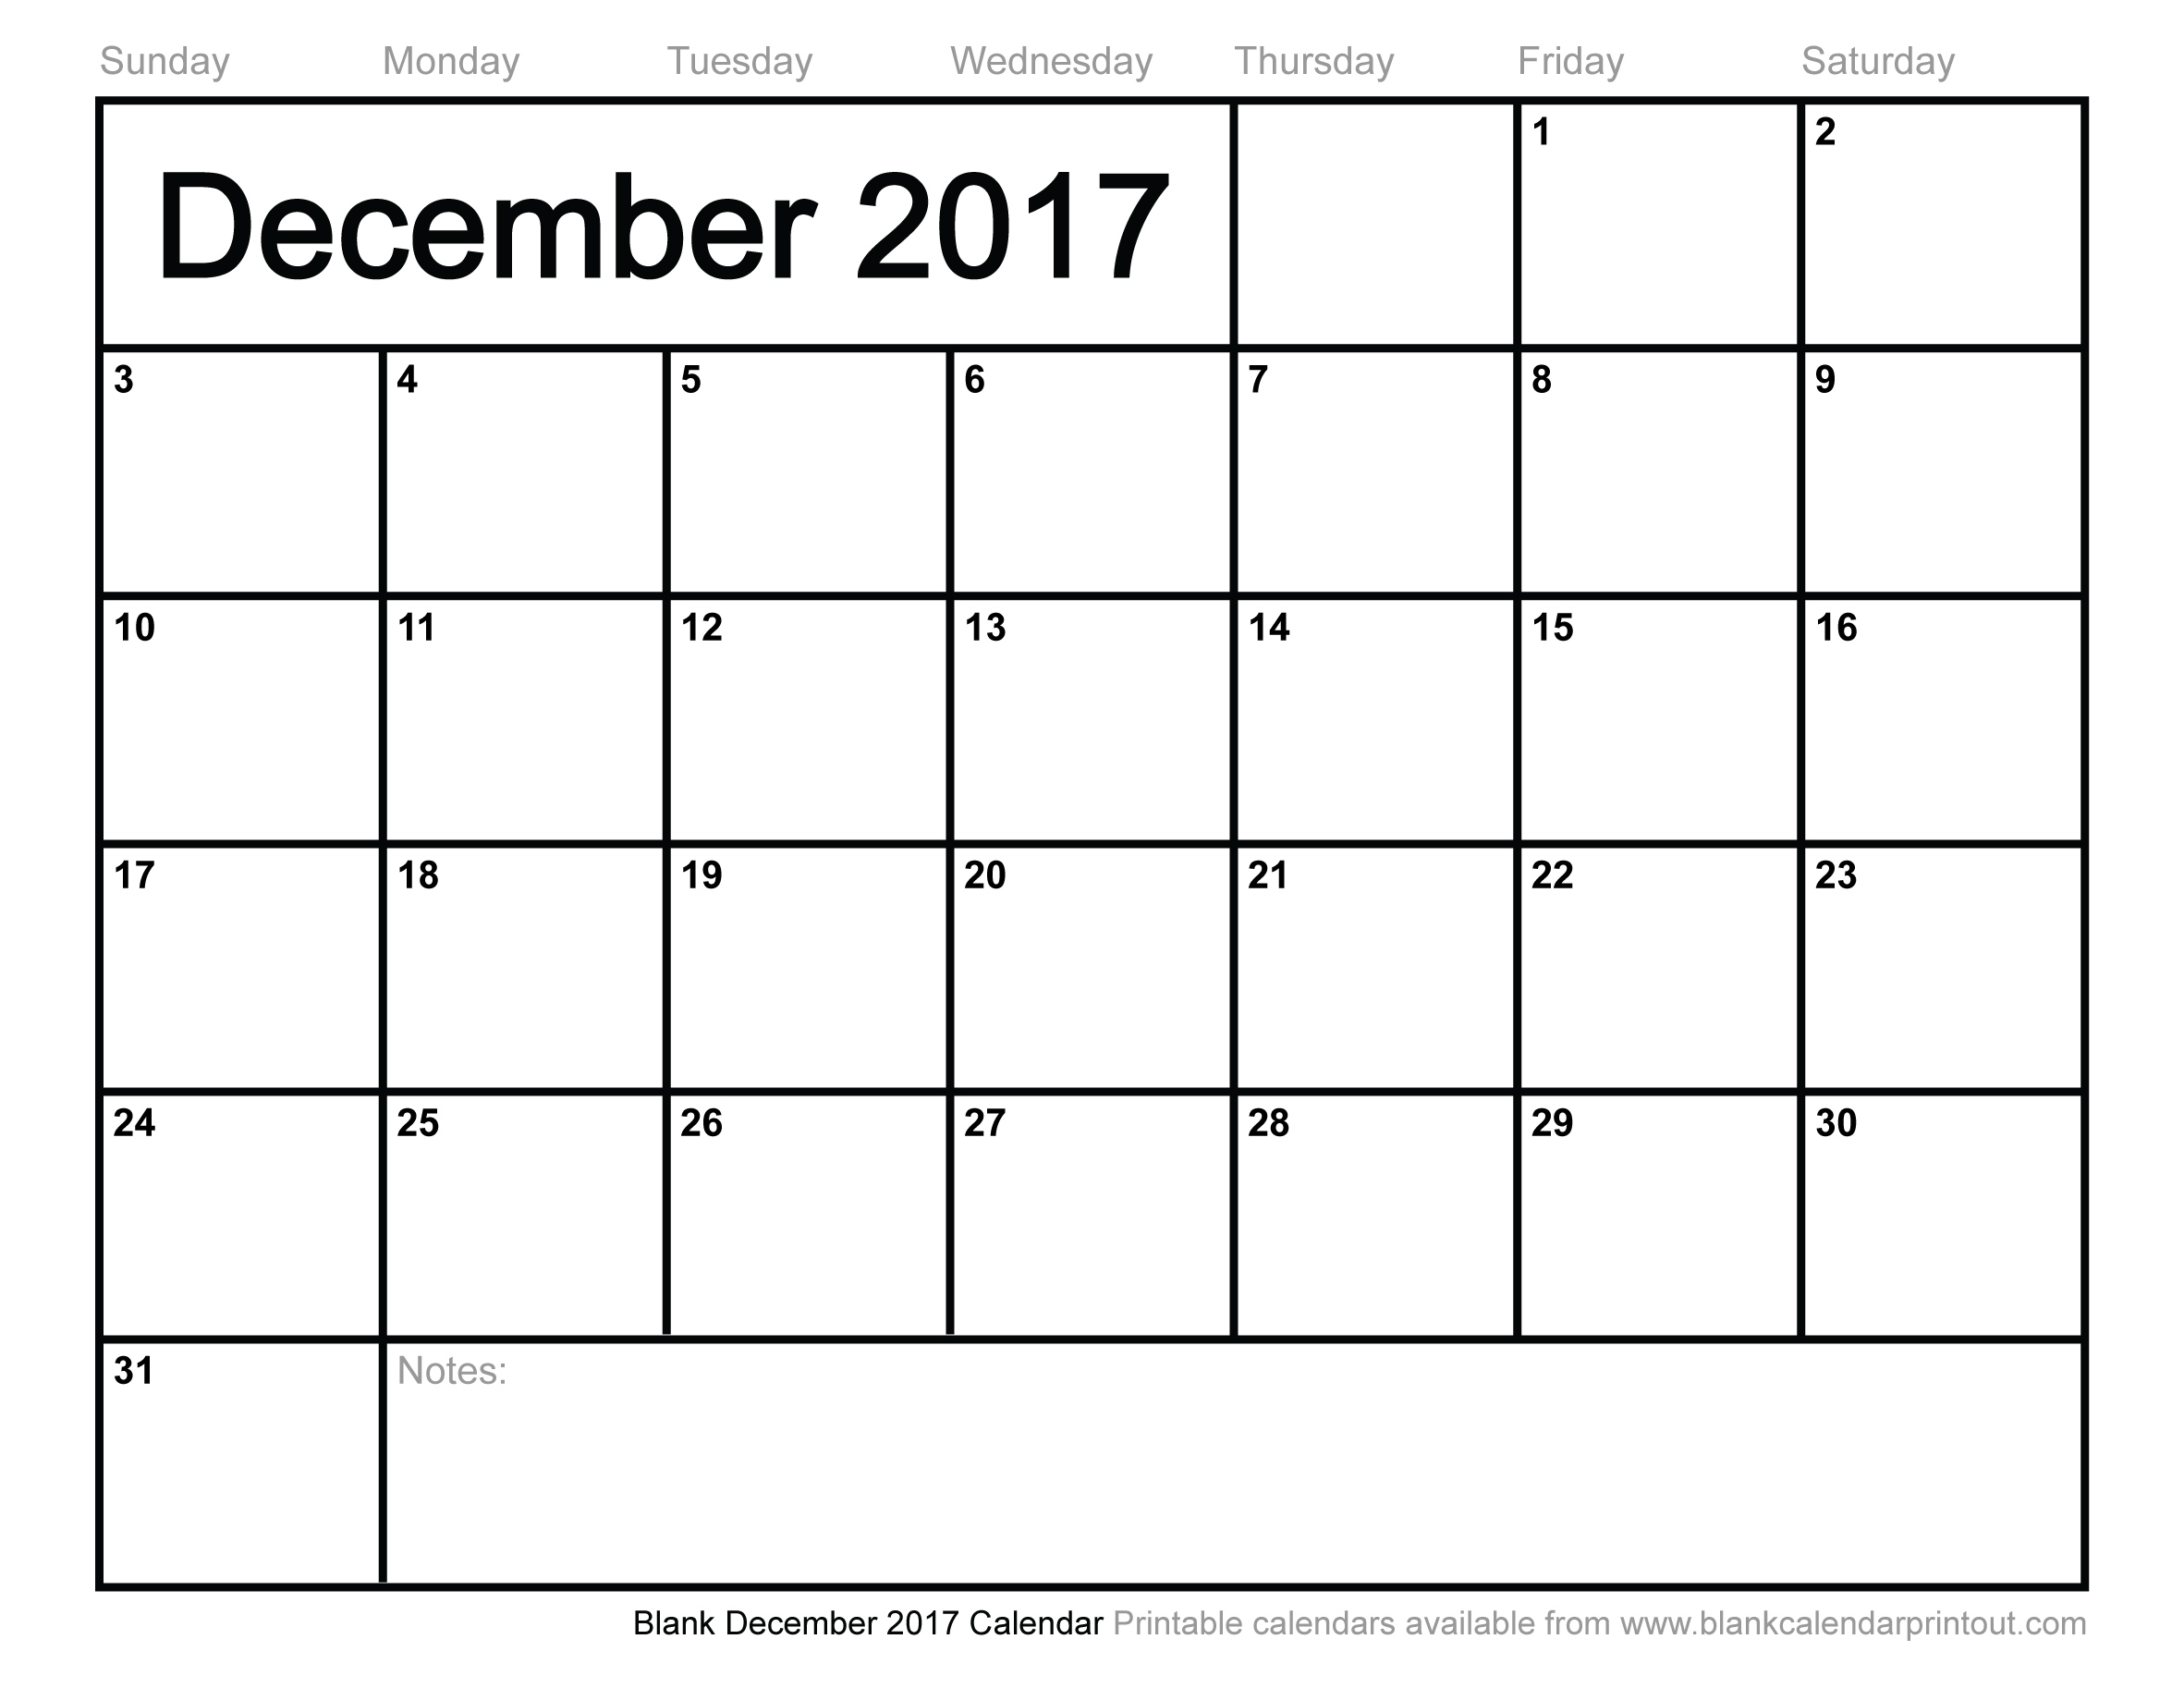 Blank December 2017 Calendar to Print